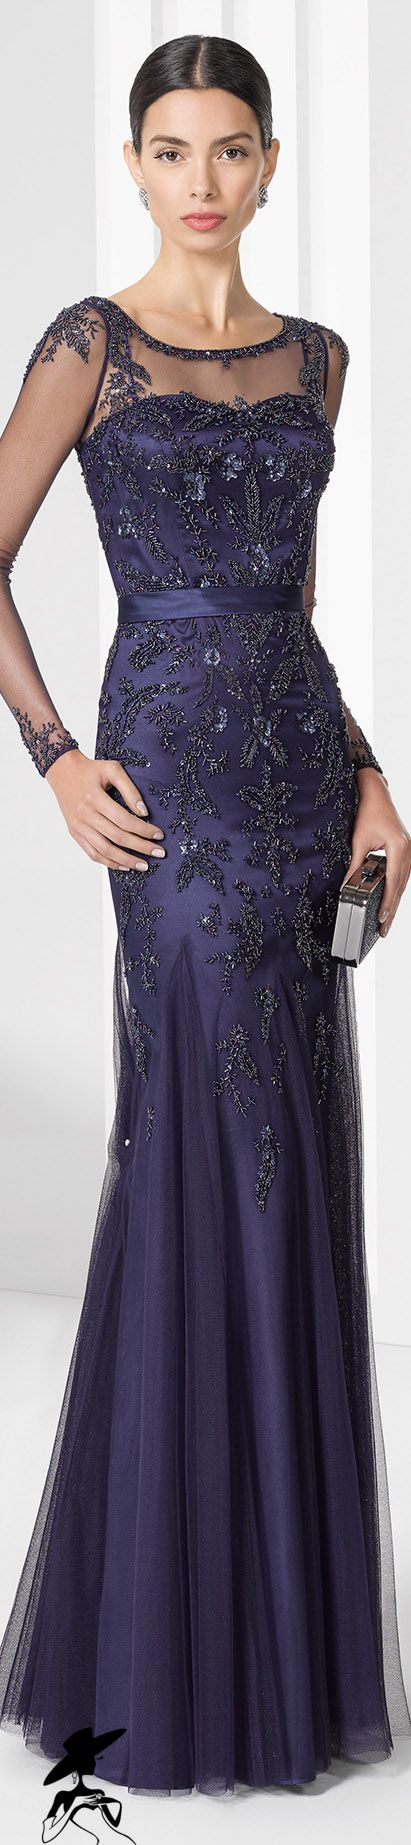 Rosa Clara.2016 | modas | Pinterest | Azul marino, Damitas de honor ...